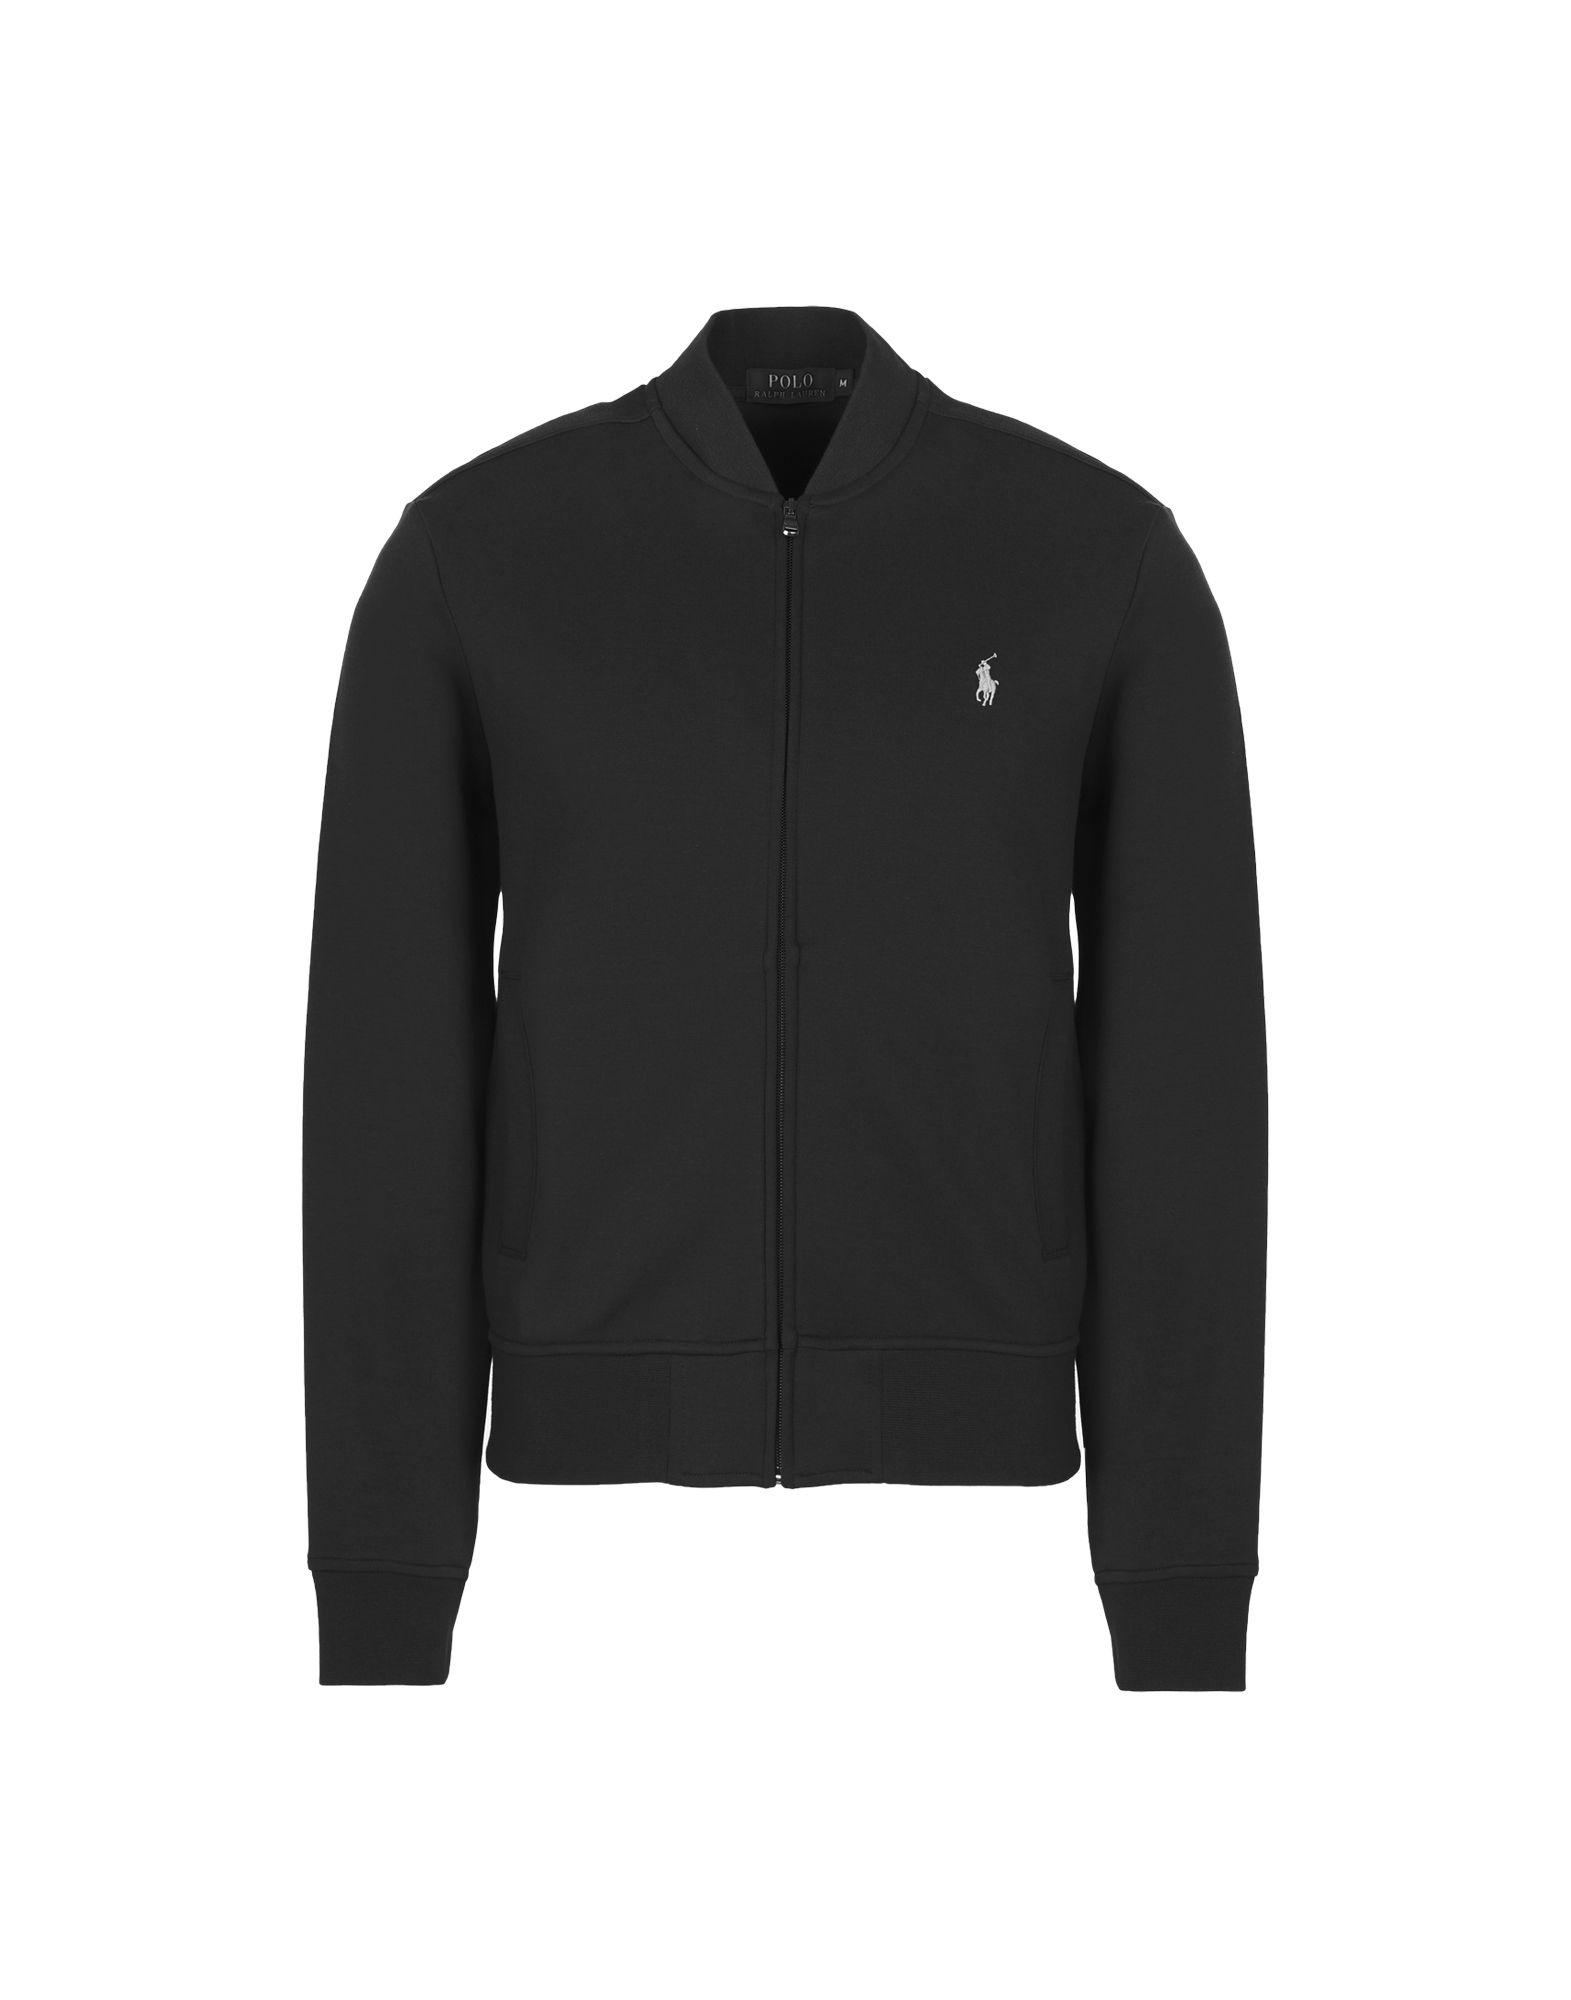 Felpa Polo Ralph Lauren Double Knit Bomber - Uomo - Acquista online su